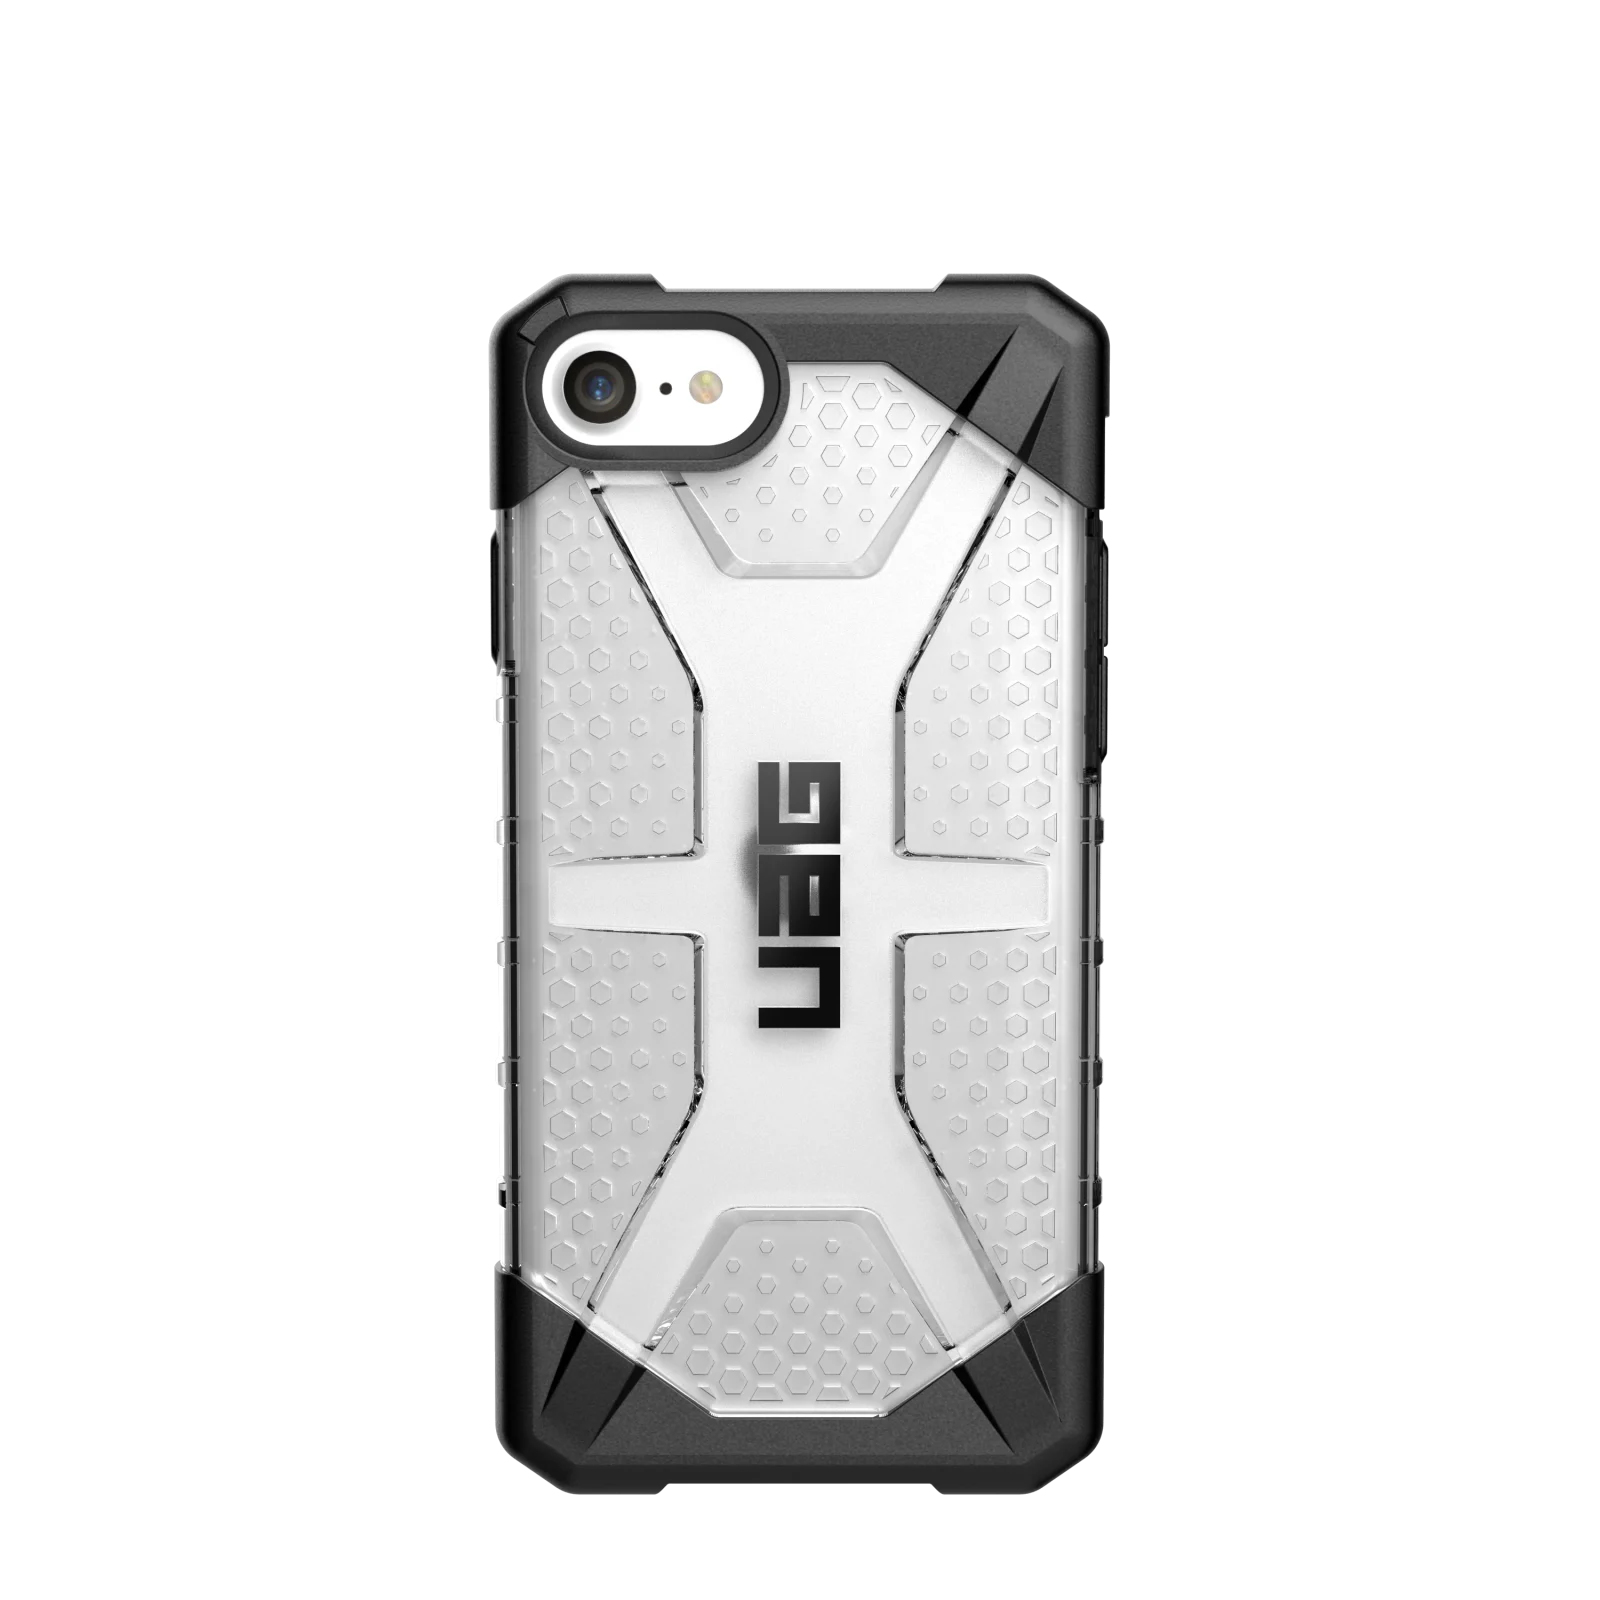 "Urban Armor Gear Plasma funda para teléfono móvil 11,9 cm (4.7"") Carcasa rígida Negro, Plata, Transparente"